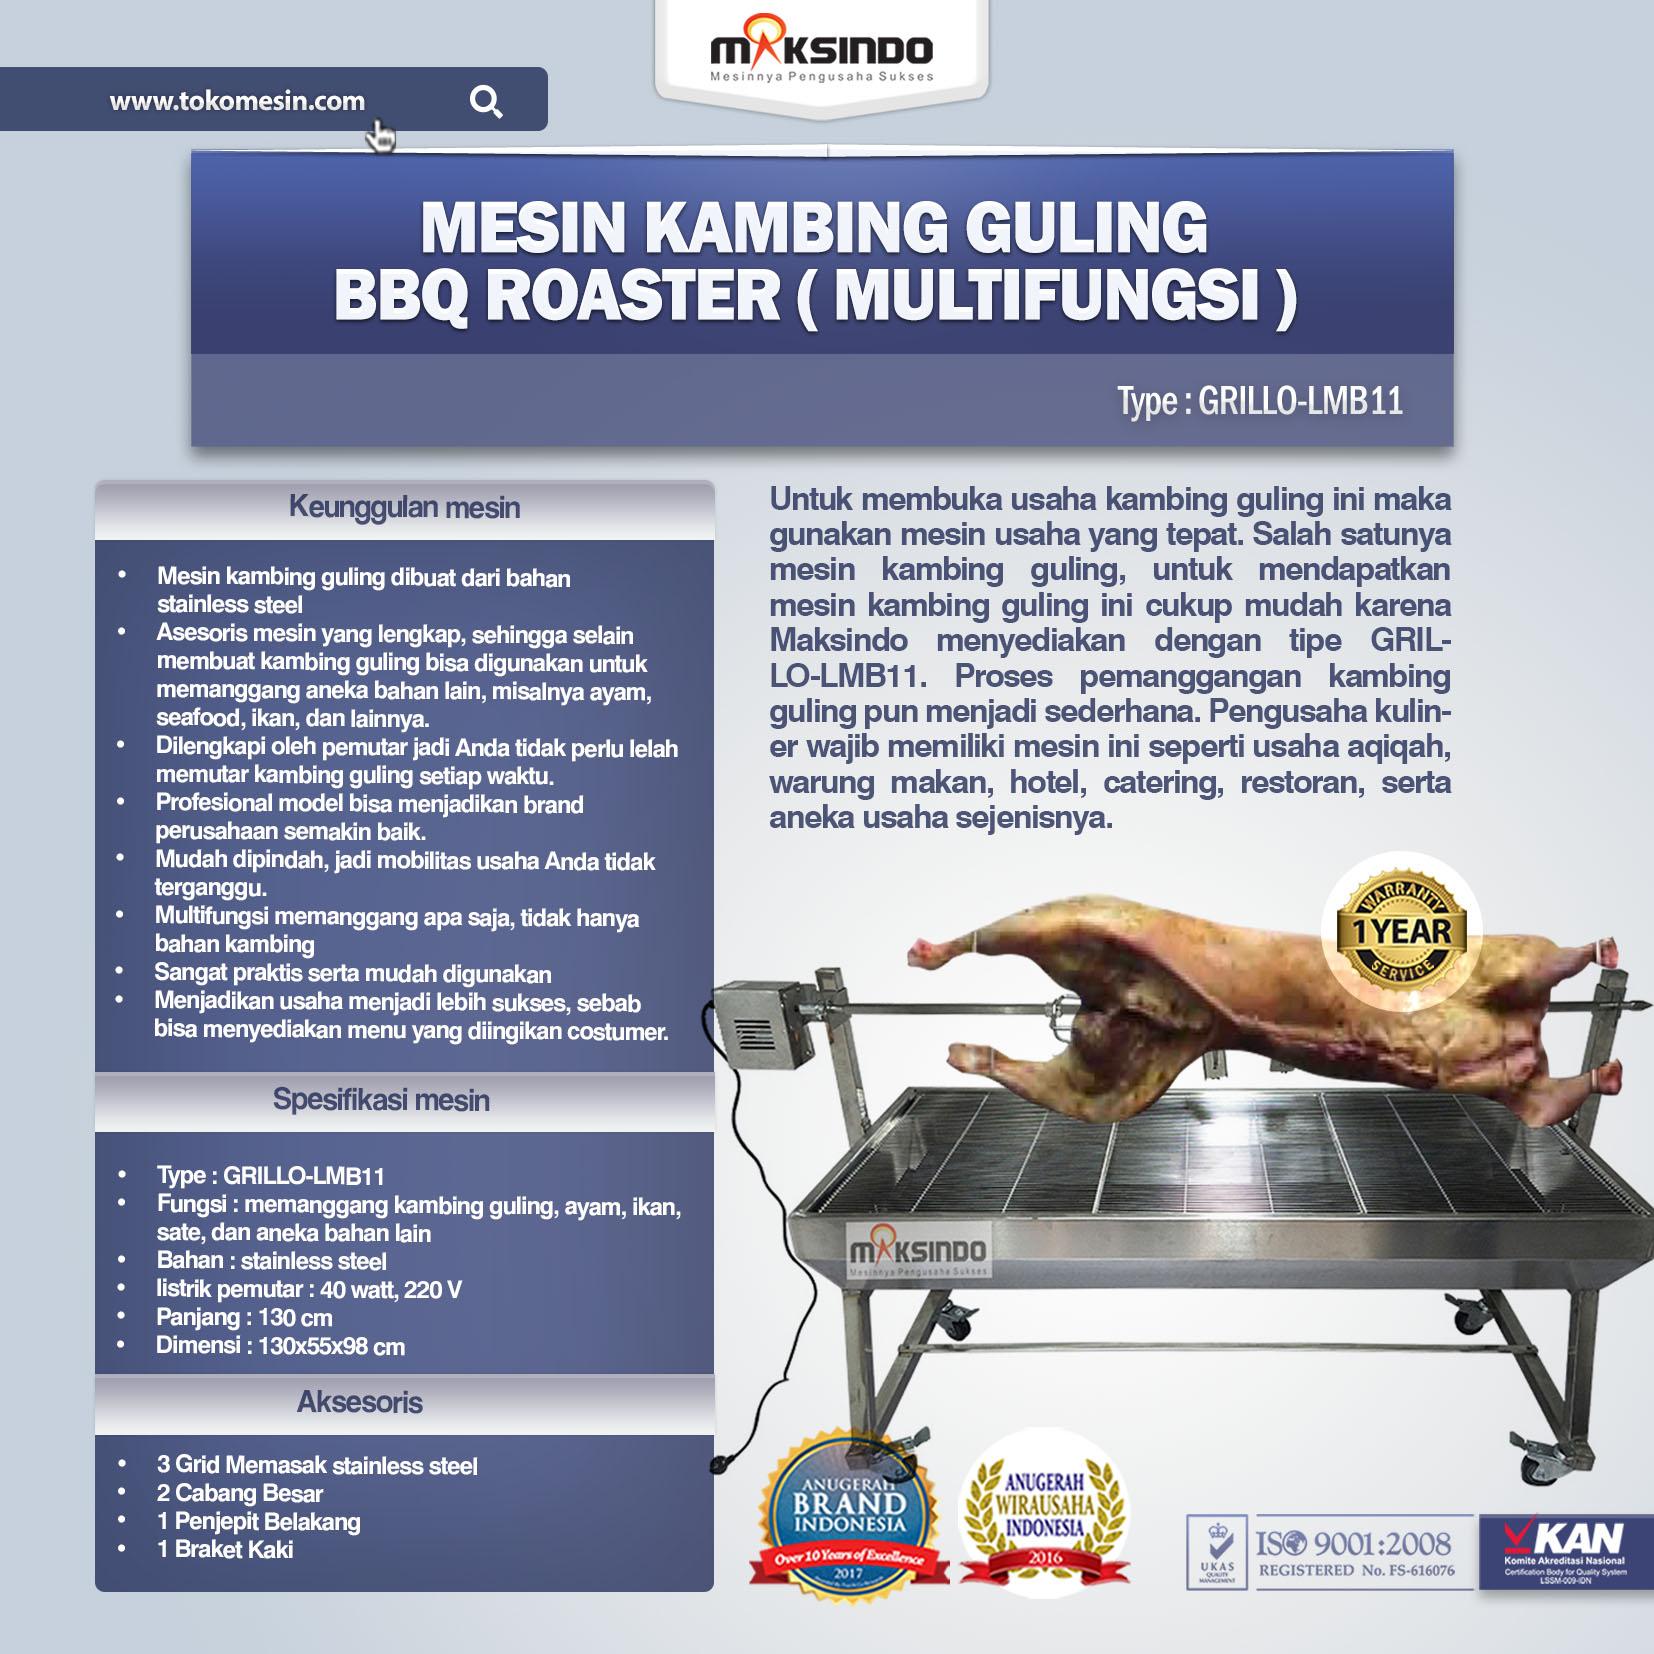 Jual BBQ Roaster (GRILLO-LMB11) di Pekanbaru